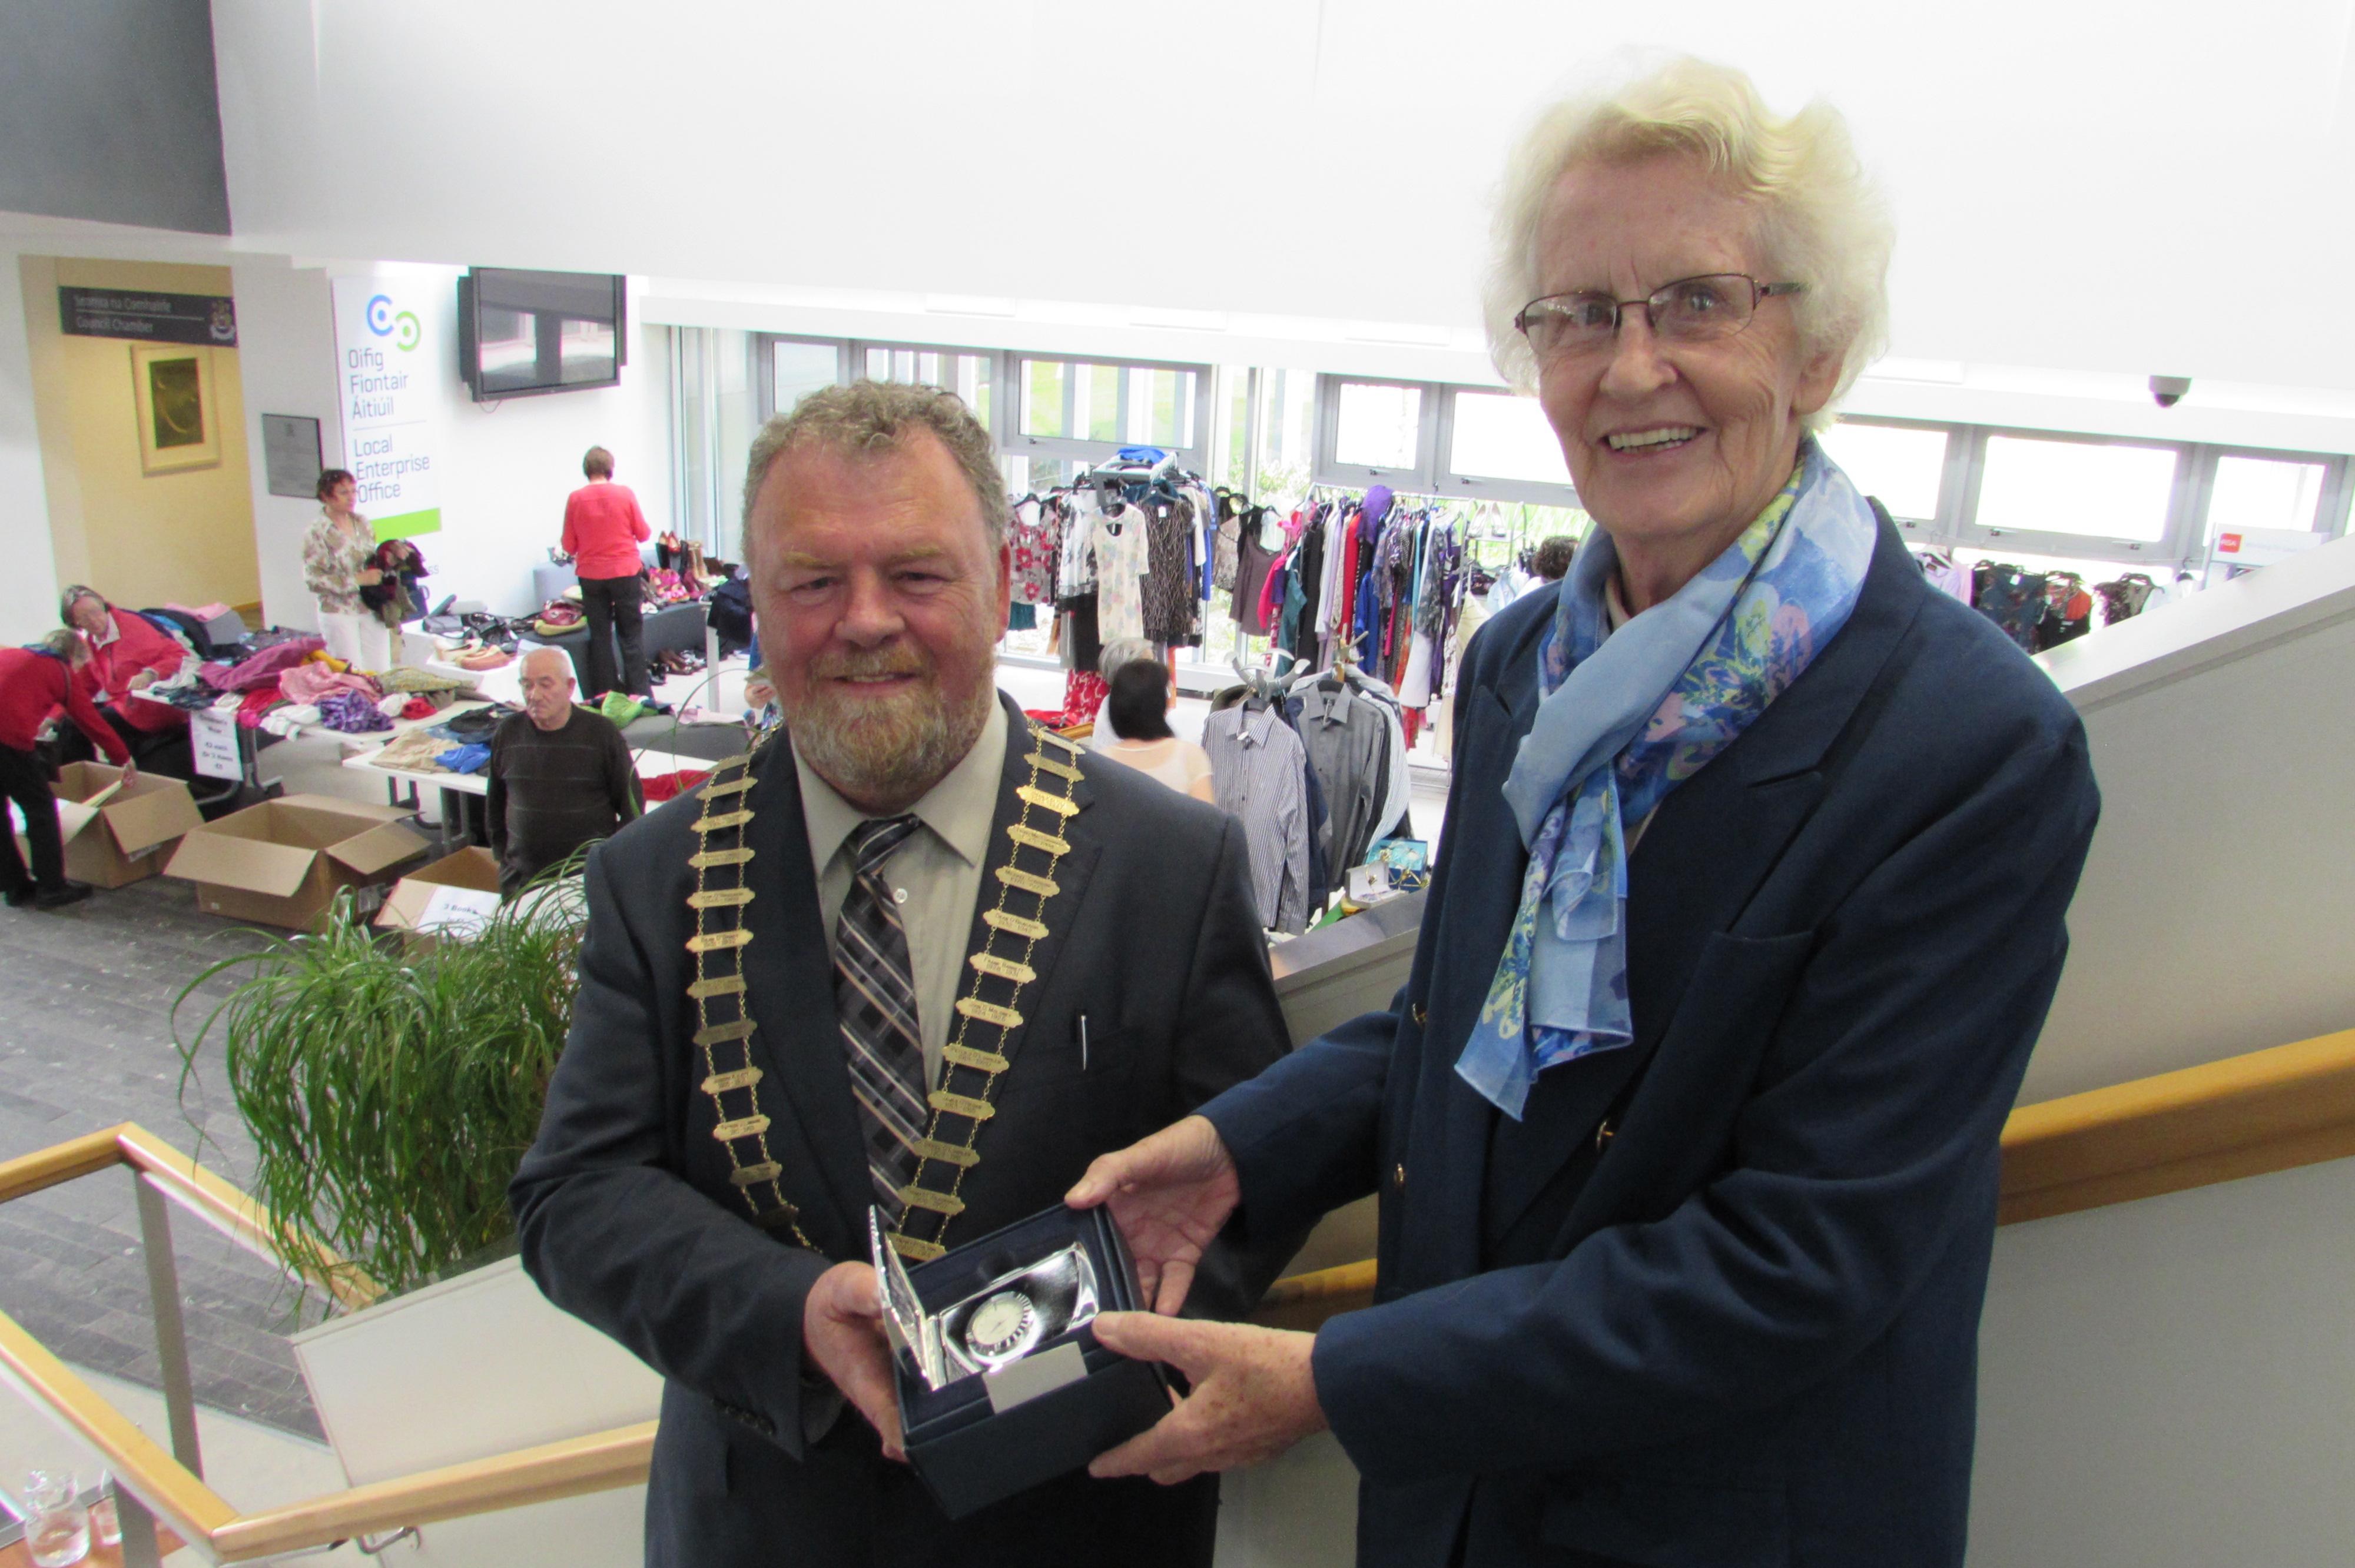 Sr. Mary Ann Neylon pictured with Mayor of Clare Cllr. Joe Arkins at the upcycling event at Áras Contae an Chláir